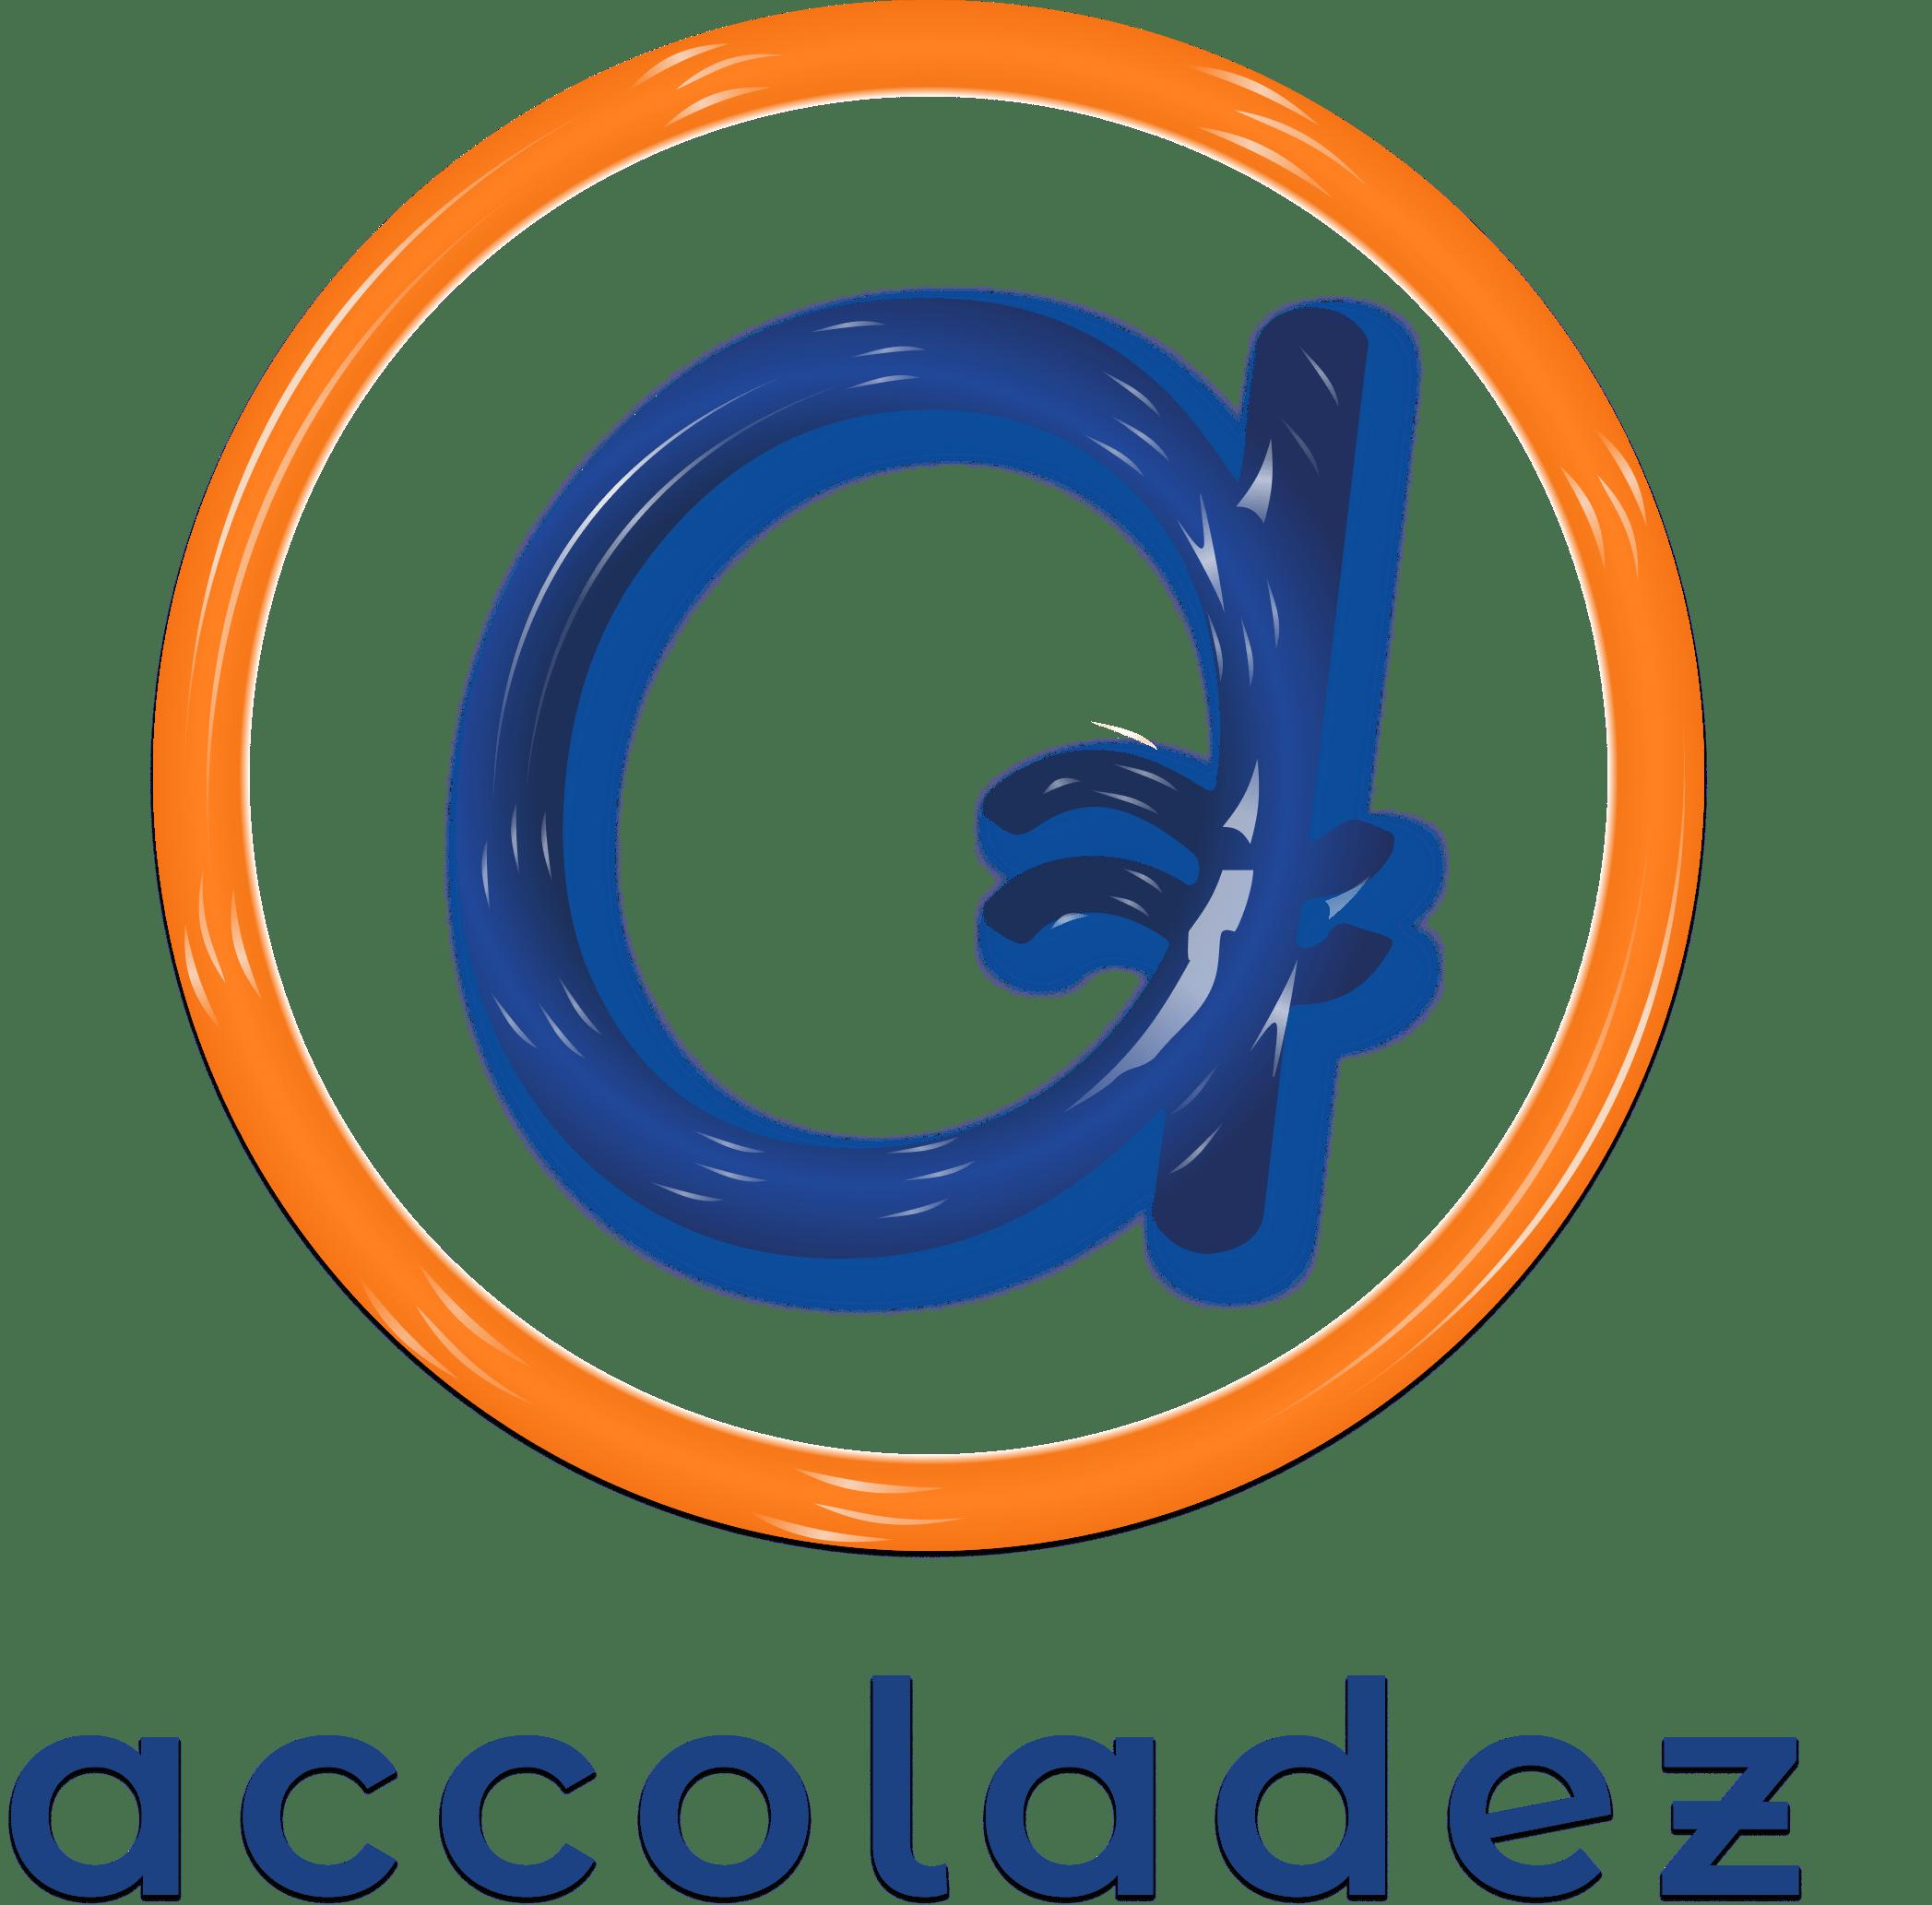 Accoladez_logo